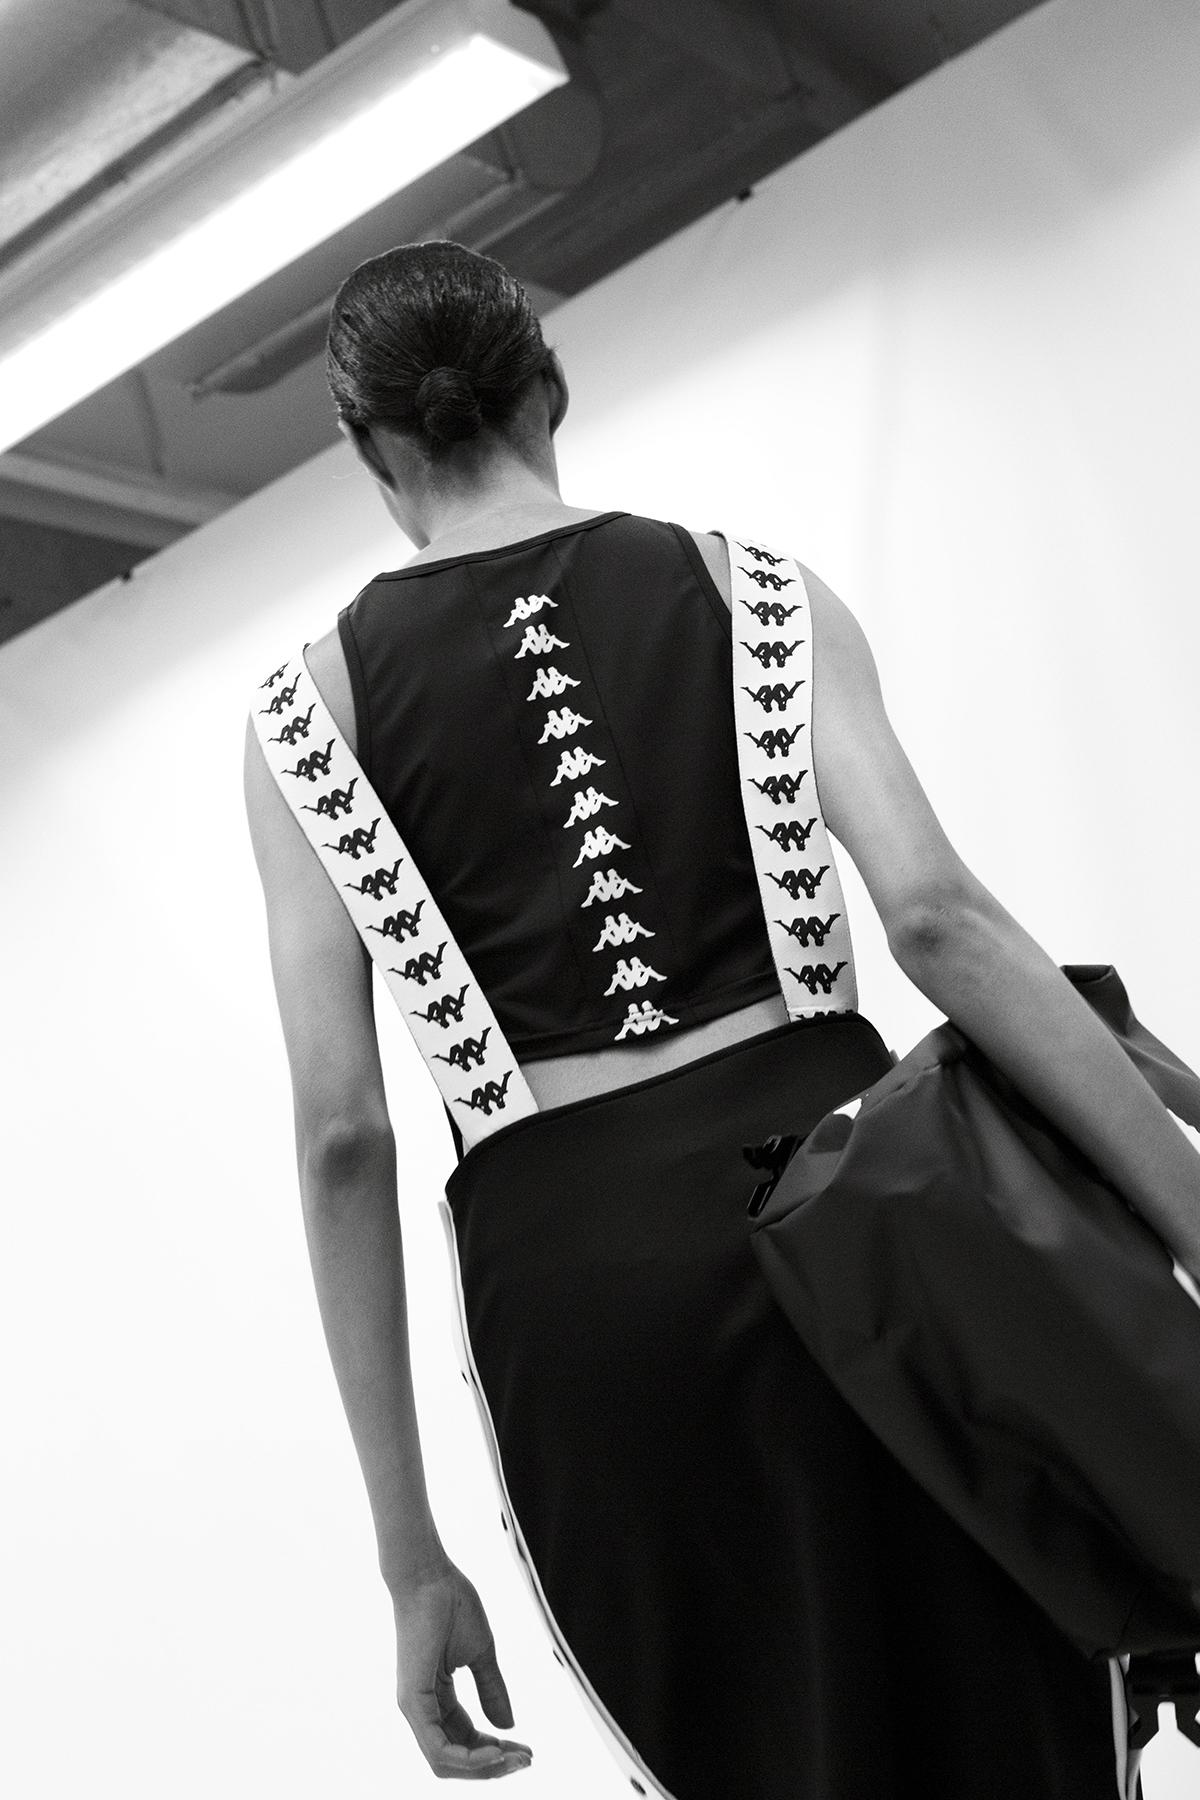 05_kappa_runway_editorial_fashion_federica_borgato